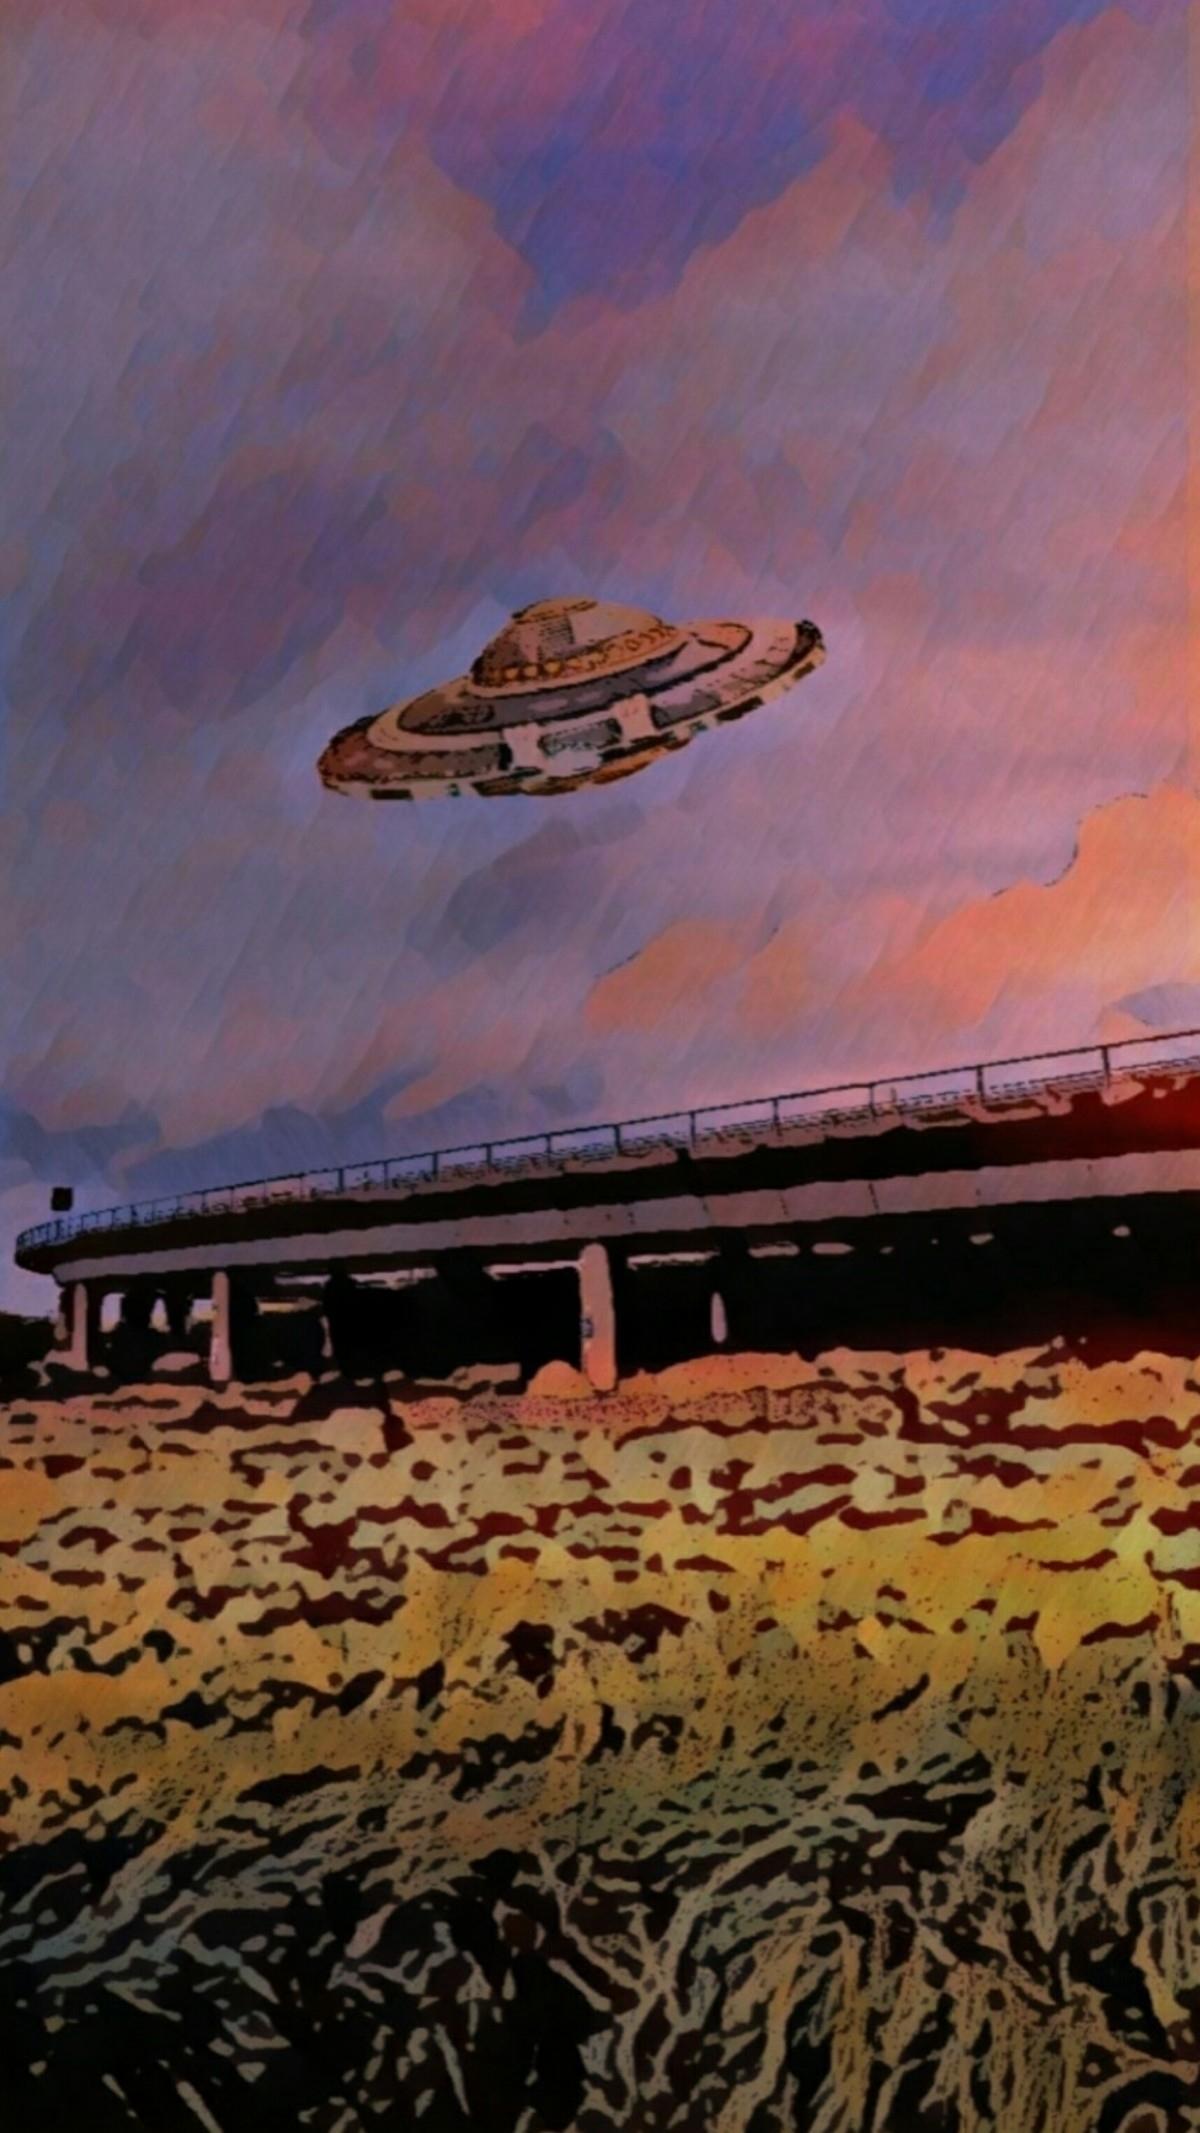 UFO HIGHWAY - novaexpress93, ufo - novaexpress93 | ello